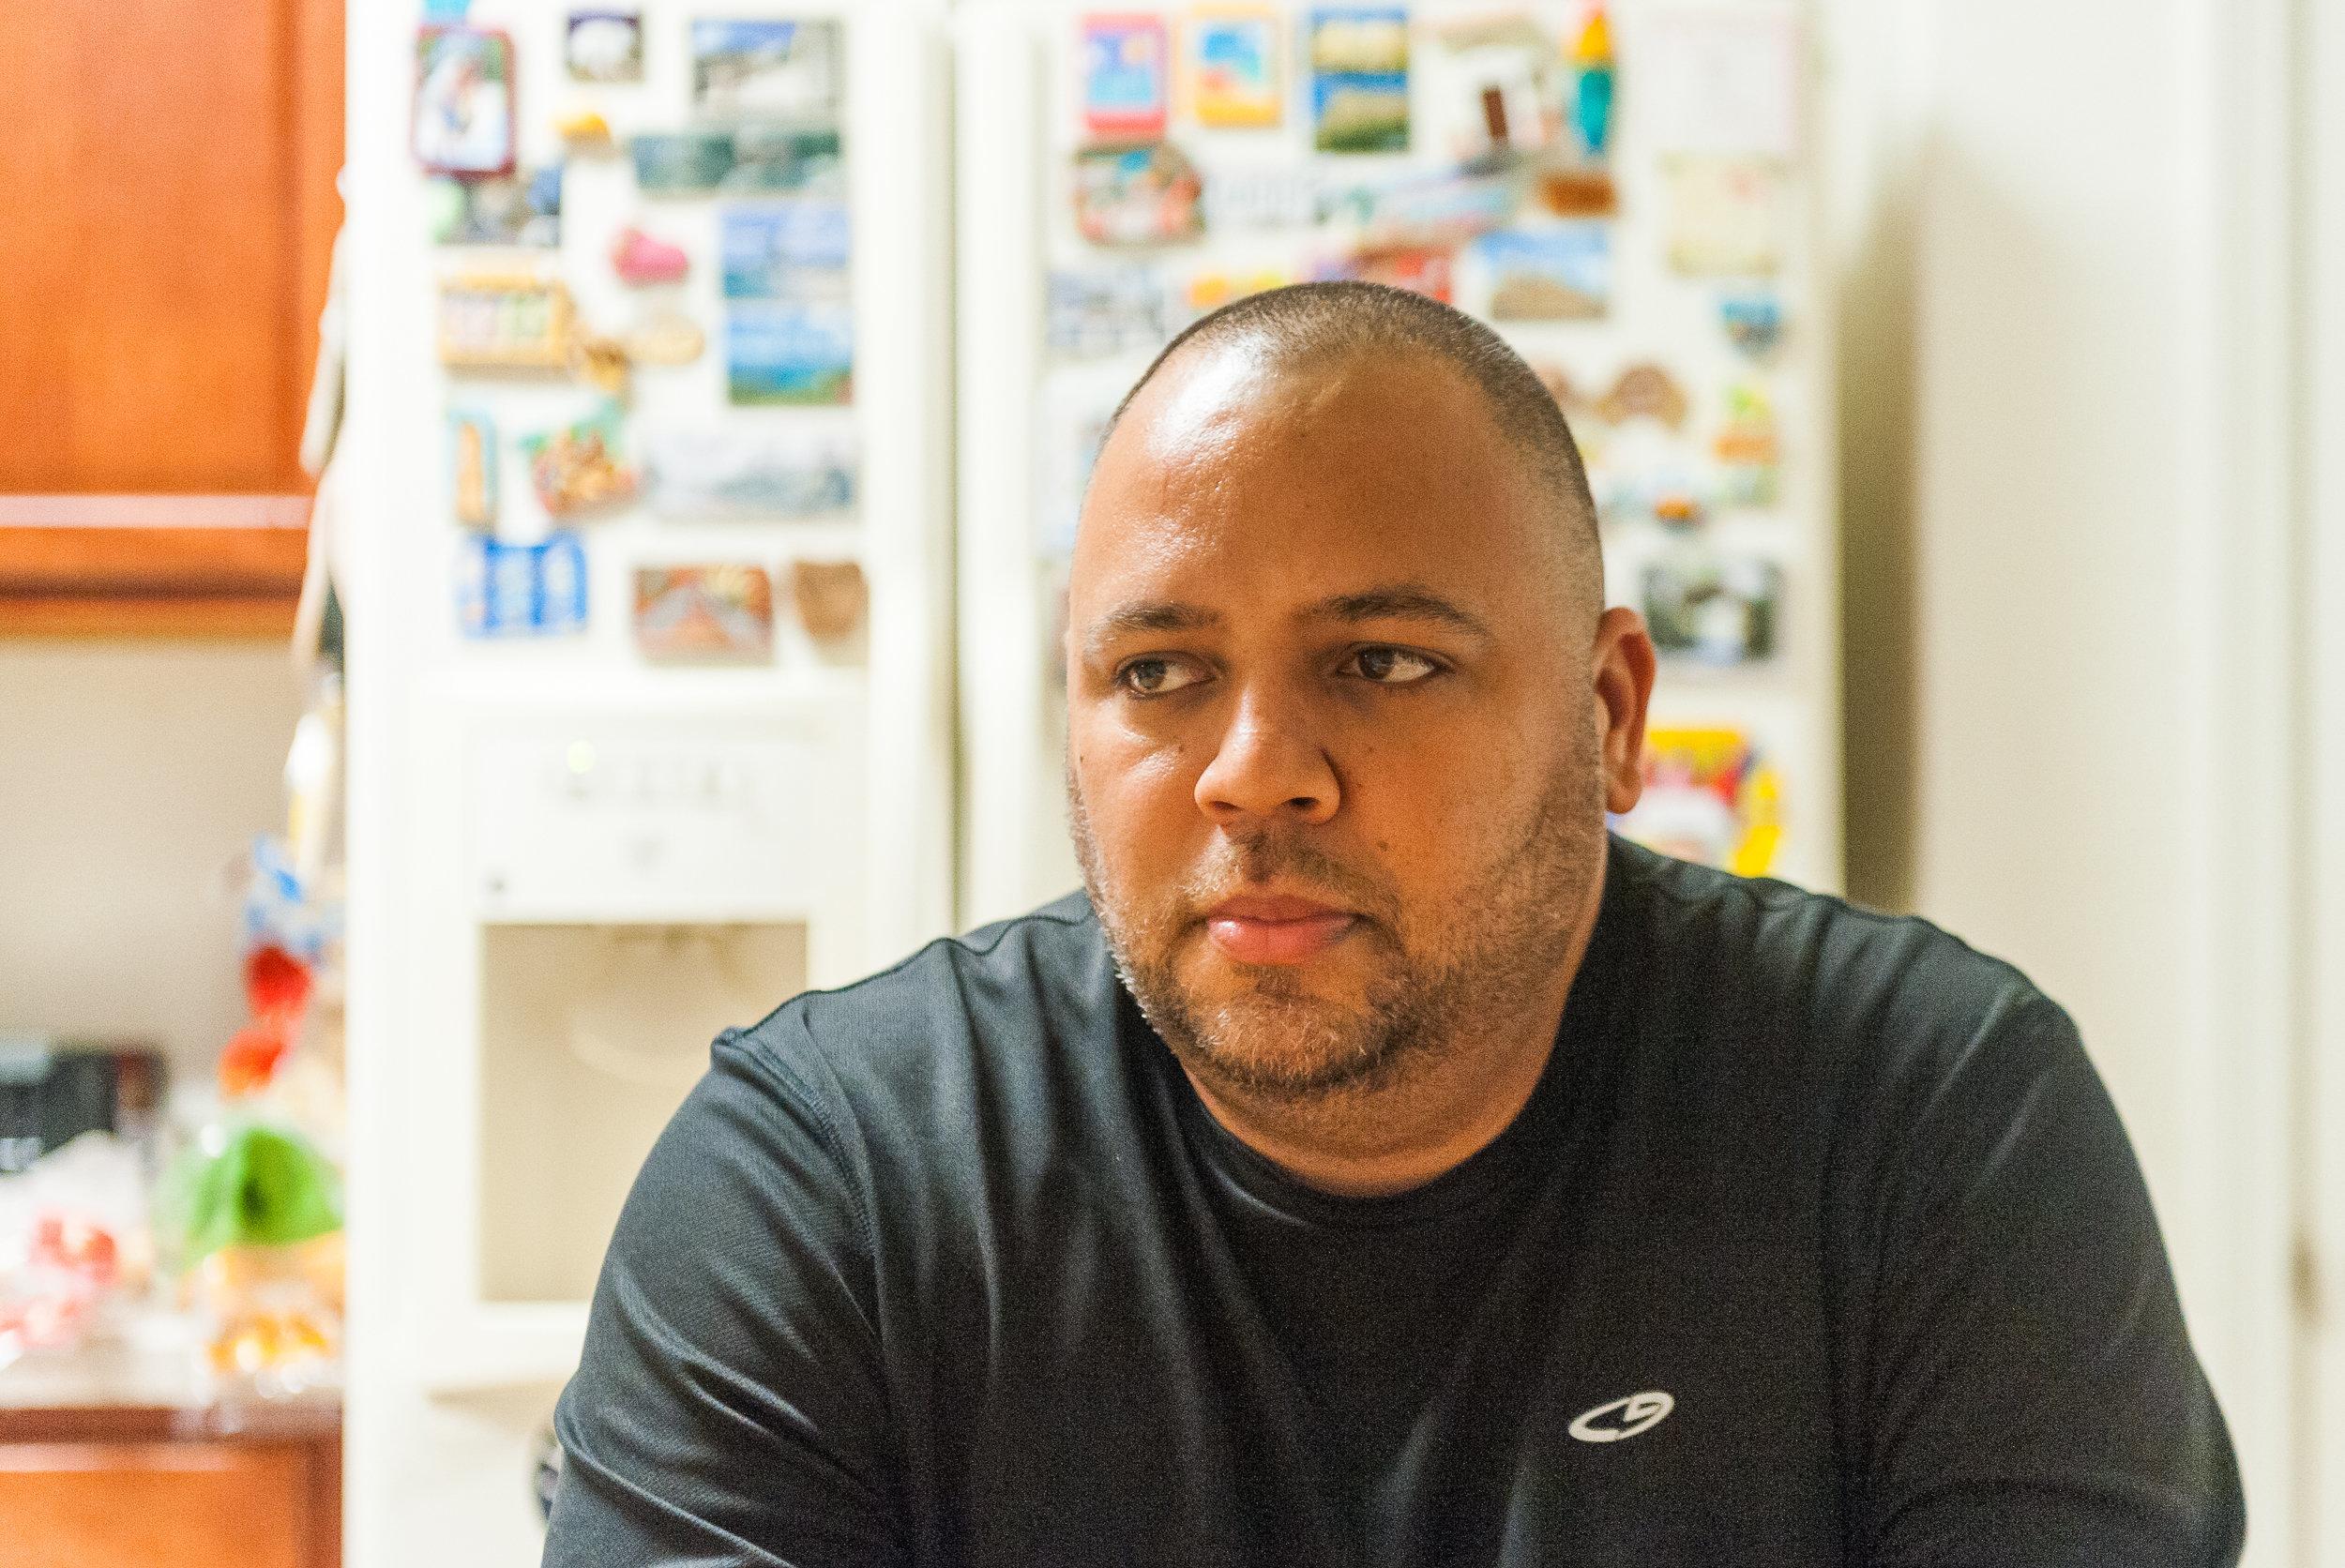 Omar Delgado poses for a photo at his home in Sanford Florida